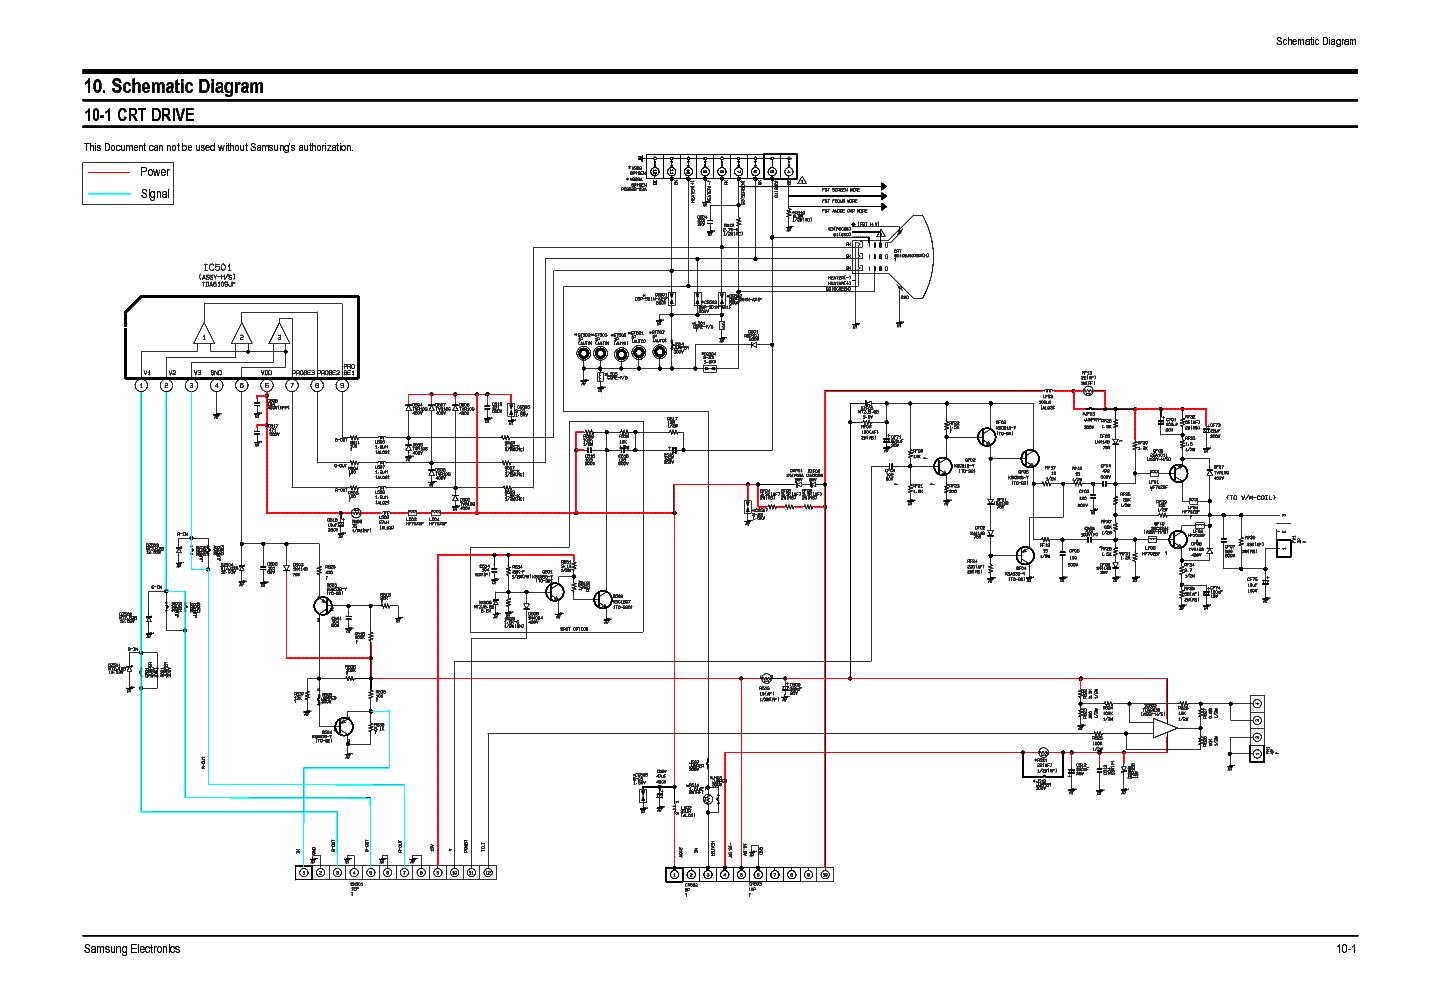 samsung cw 29m066v sch service manual download schematics eeprom rh elektrotanya com Samsung Washer Parts Manual Samsung Schematics